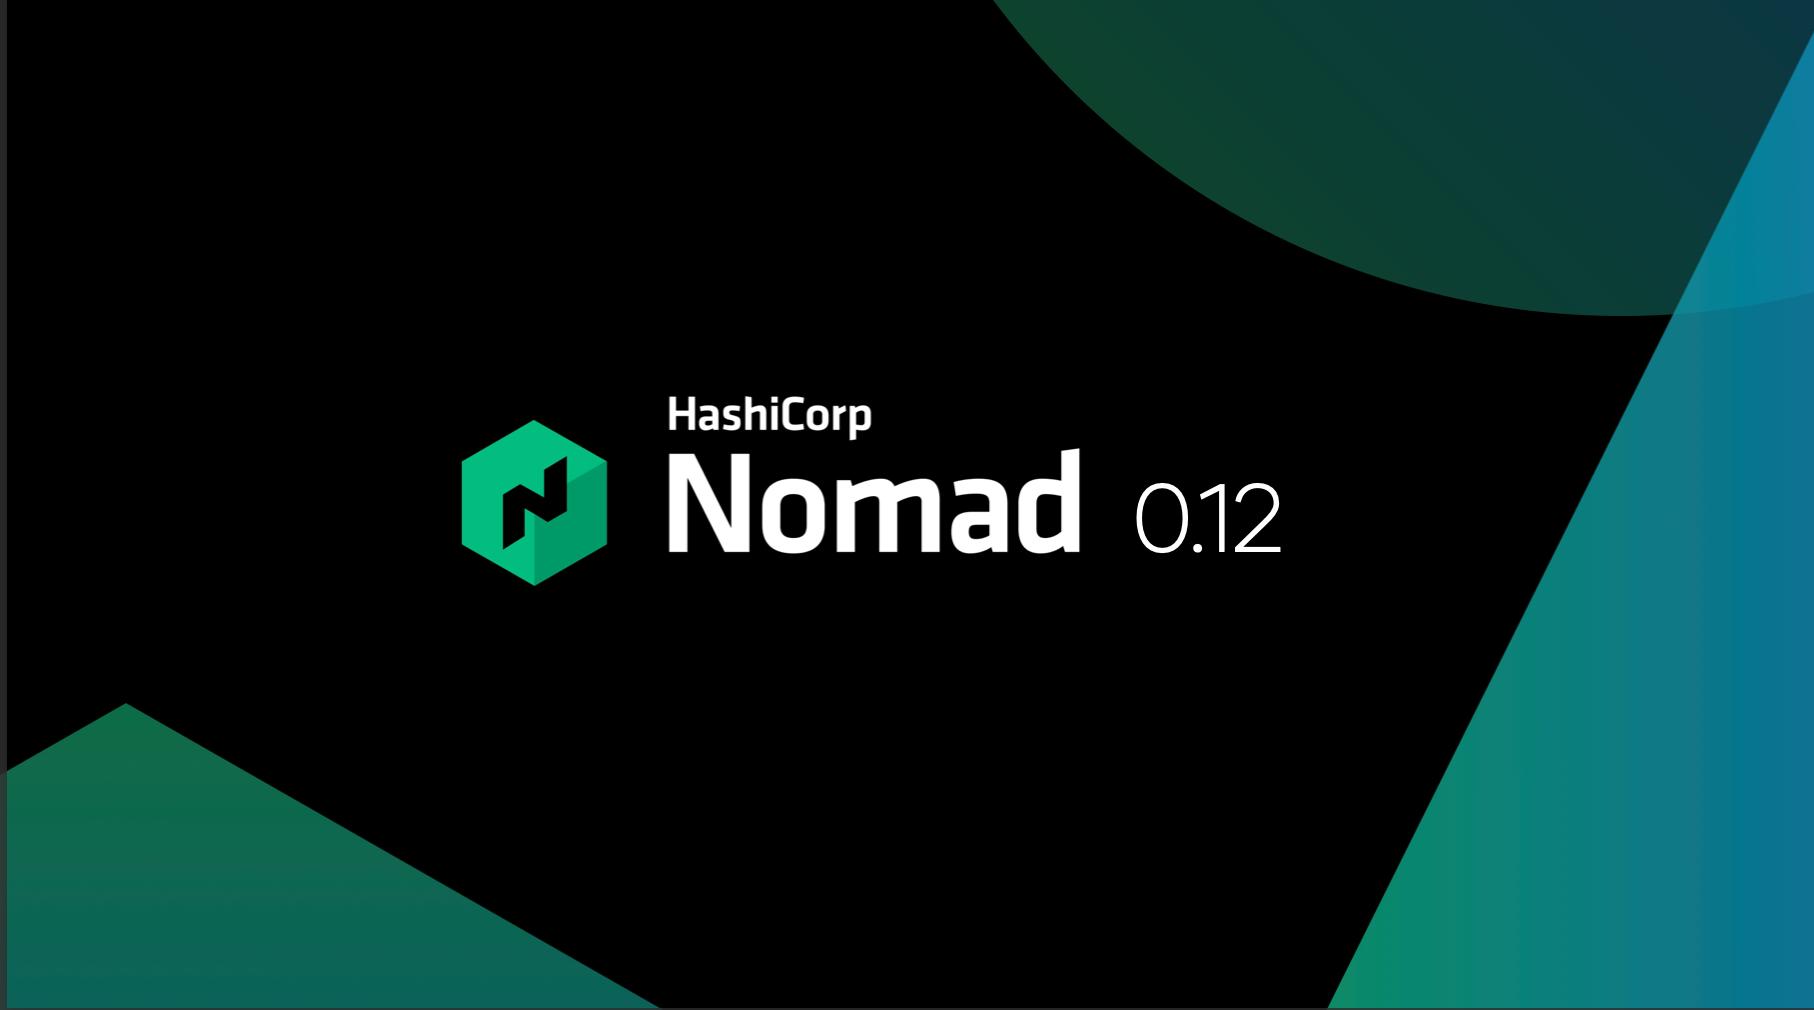 Keynote: Announcing Nomad 0.12 Image